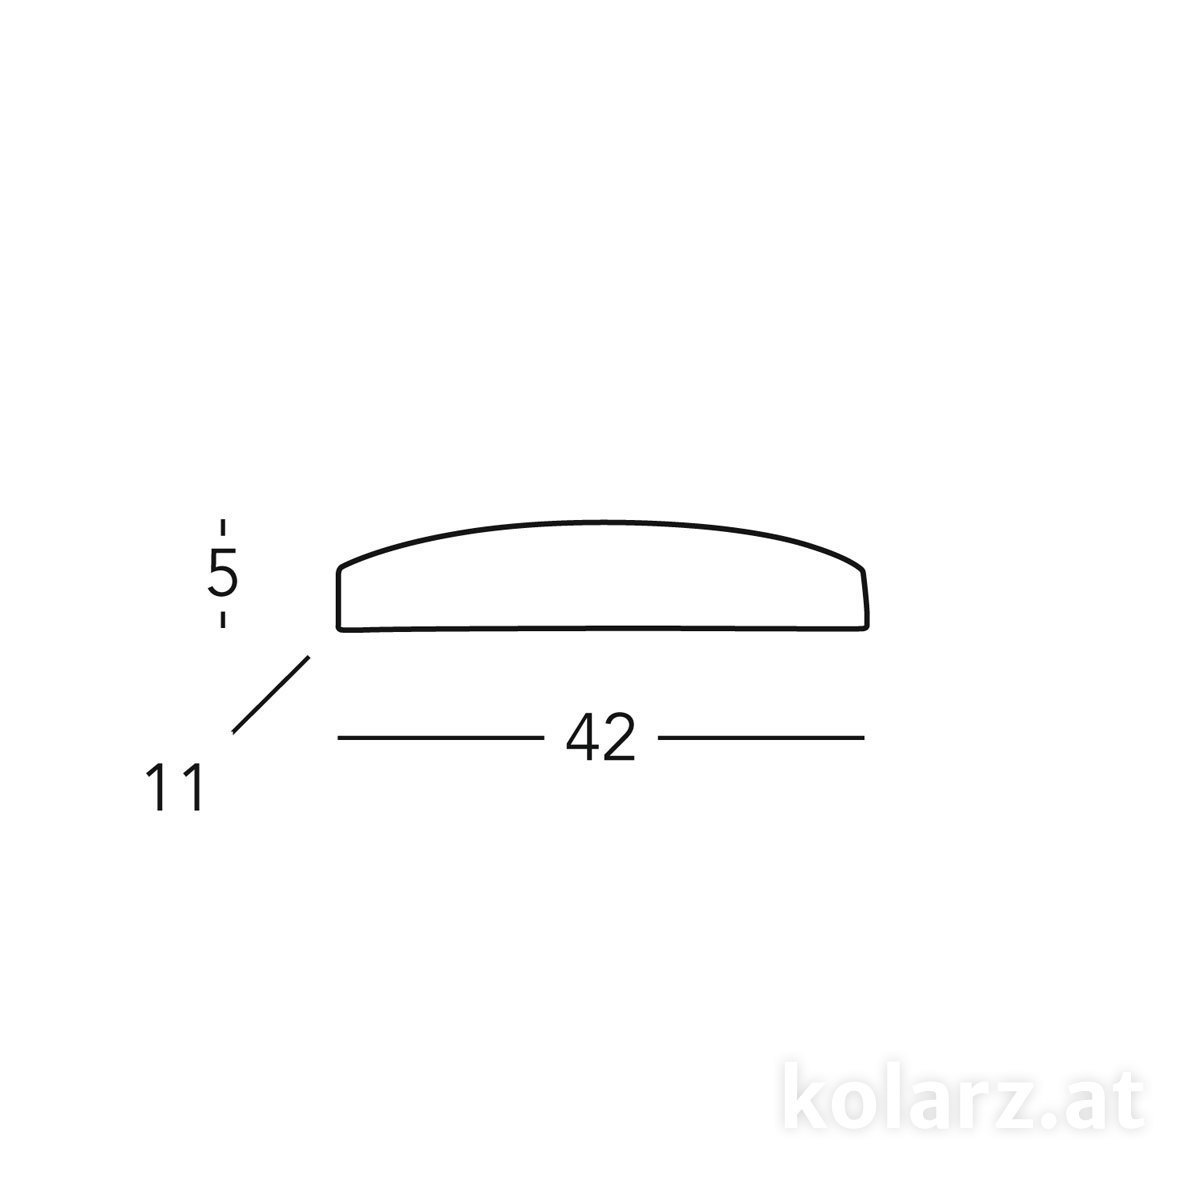 219-64-1-s1.jpg